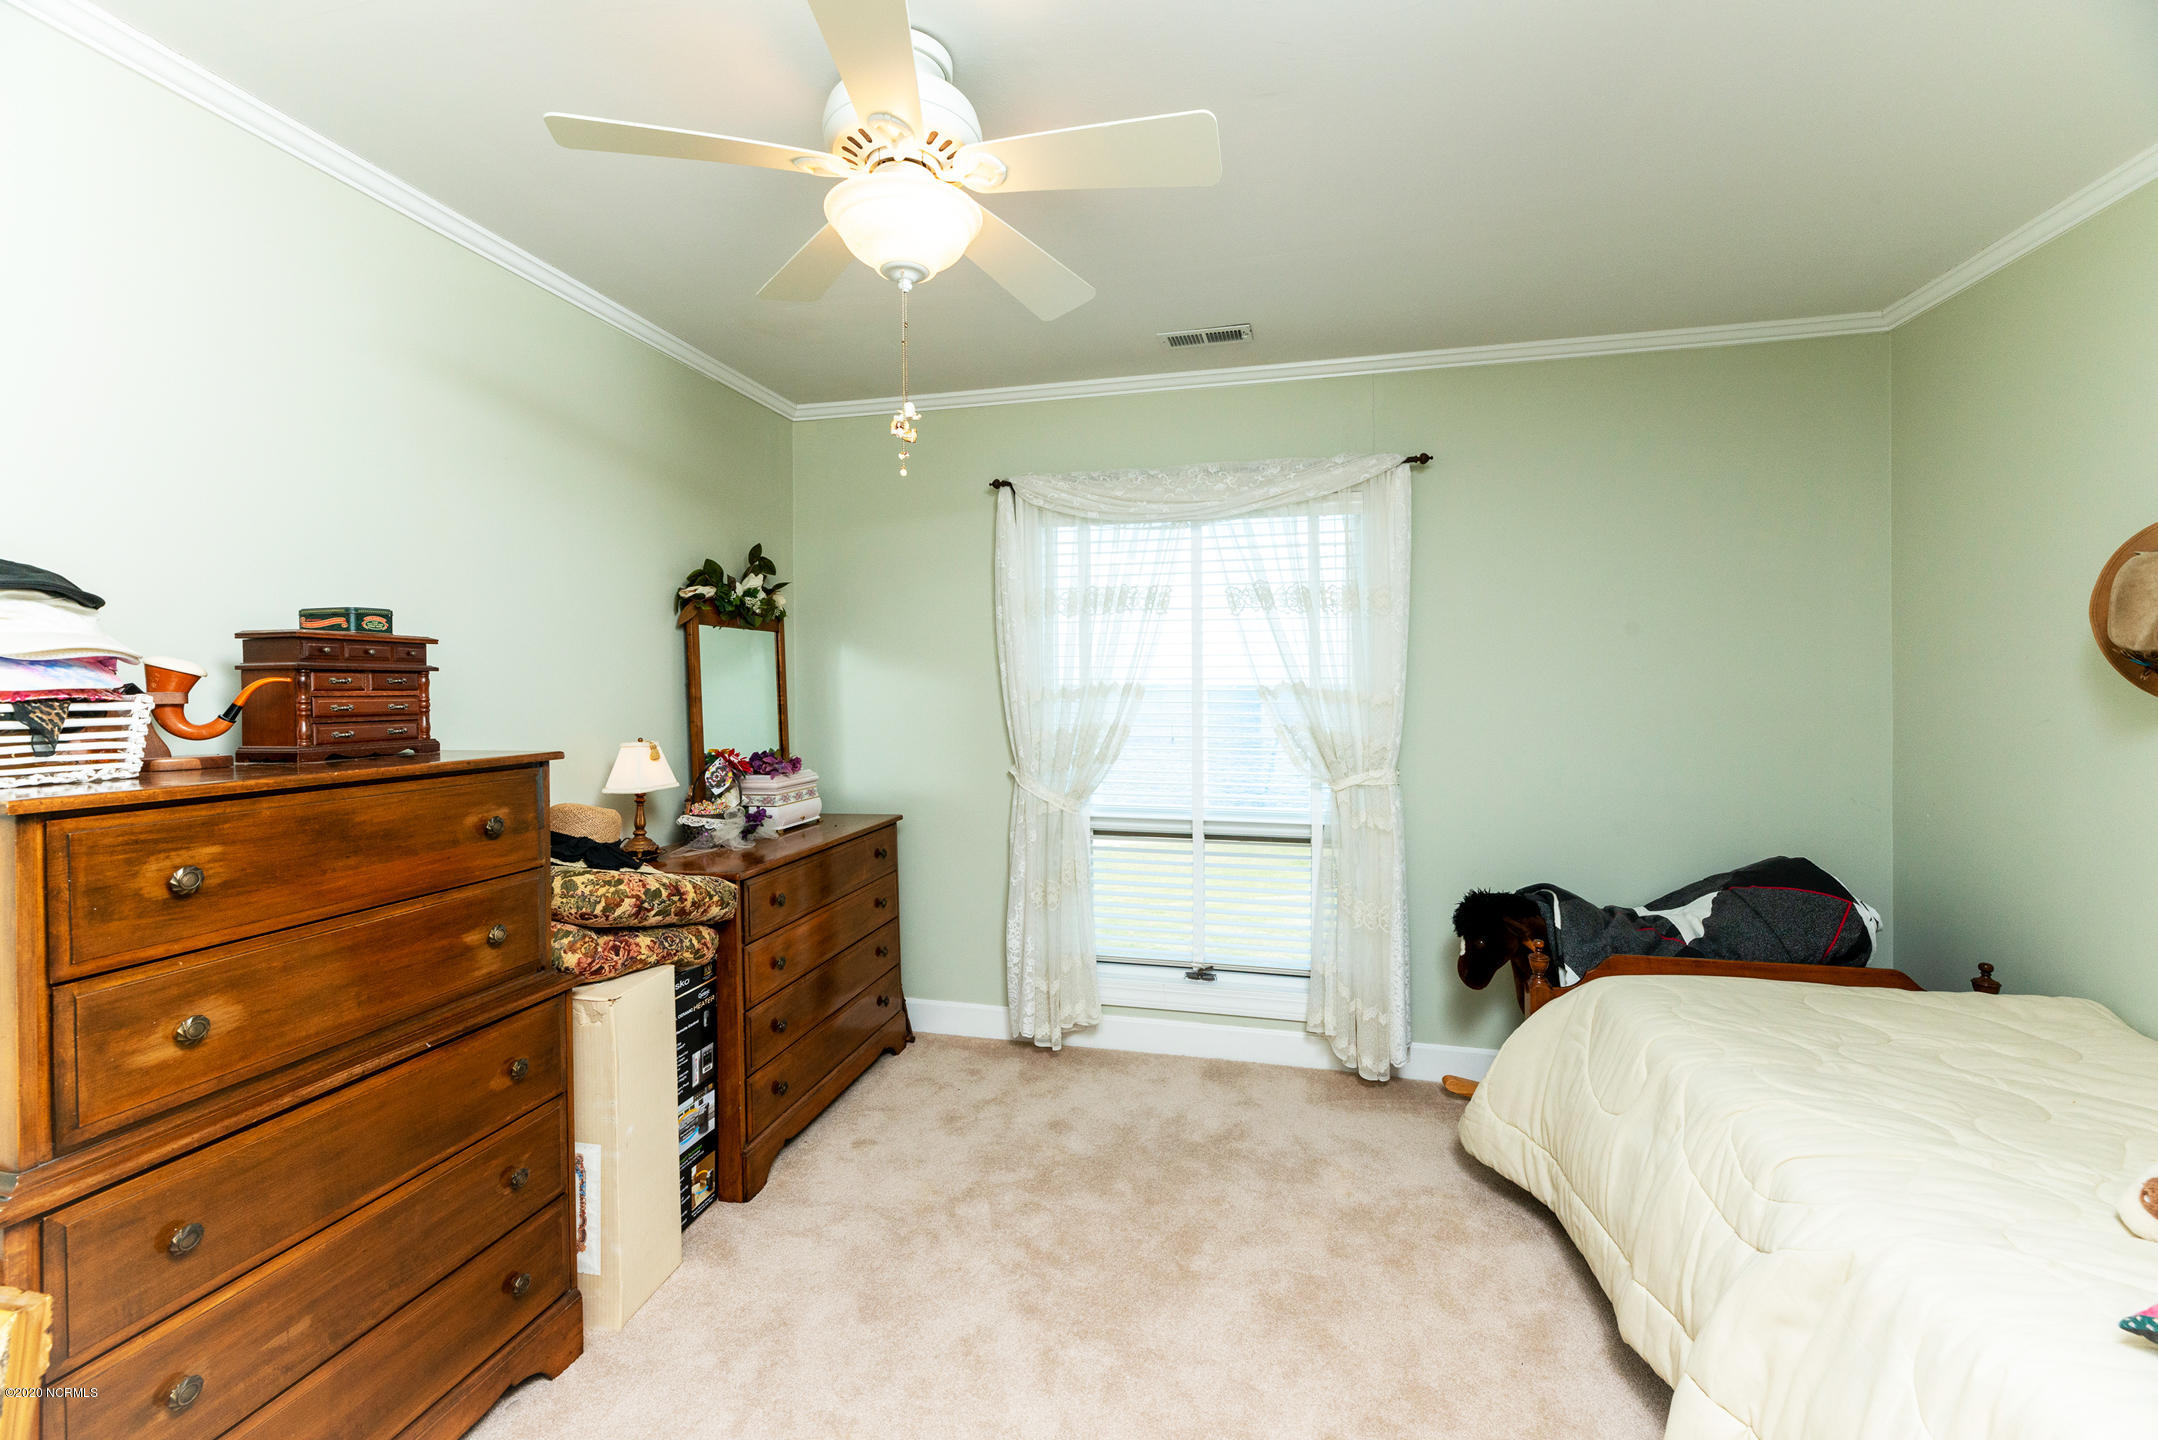 656 Norfleet Shores Road, Belhaven, North Carolina 27810, 3 Bedrooms Bedrooms, 7 Rooms Rooms,2 BathroomsBathrooms,Single family residence,For sale,Norfleet Shores,100216433